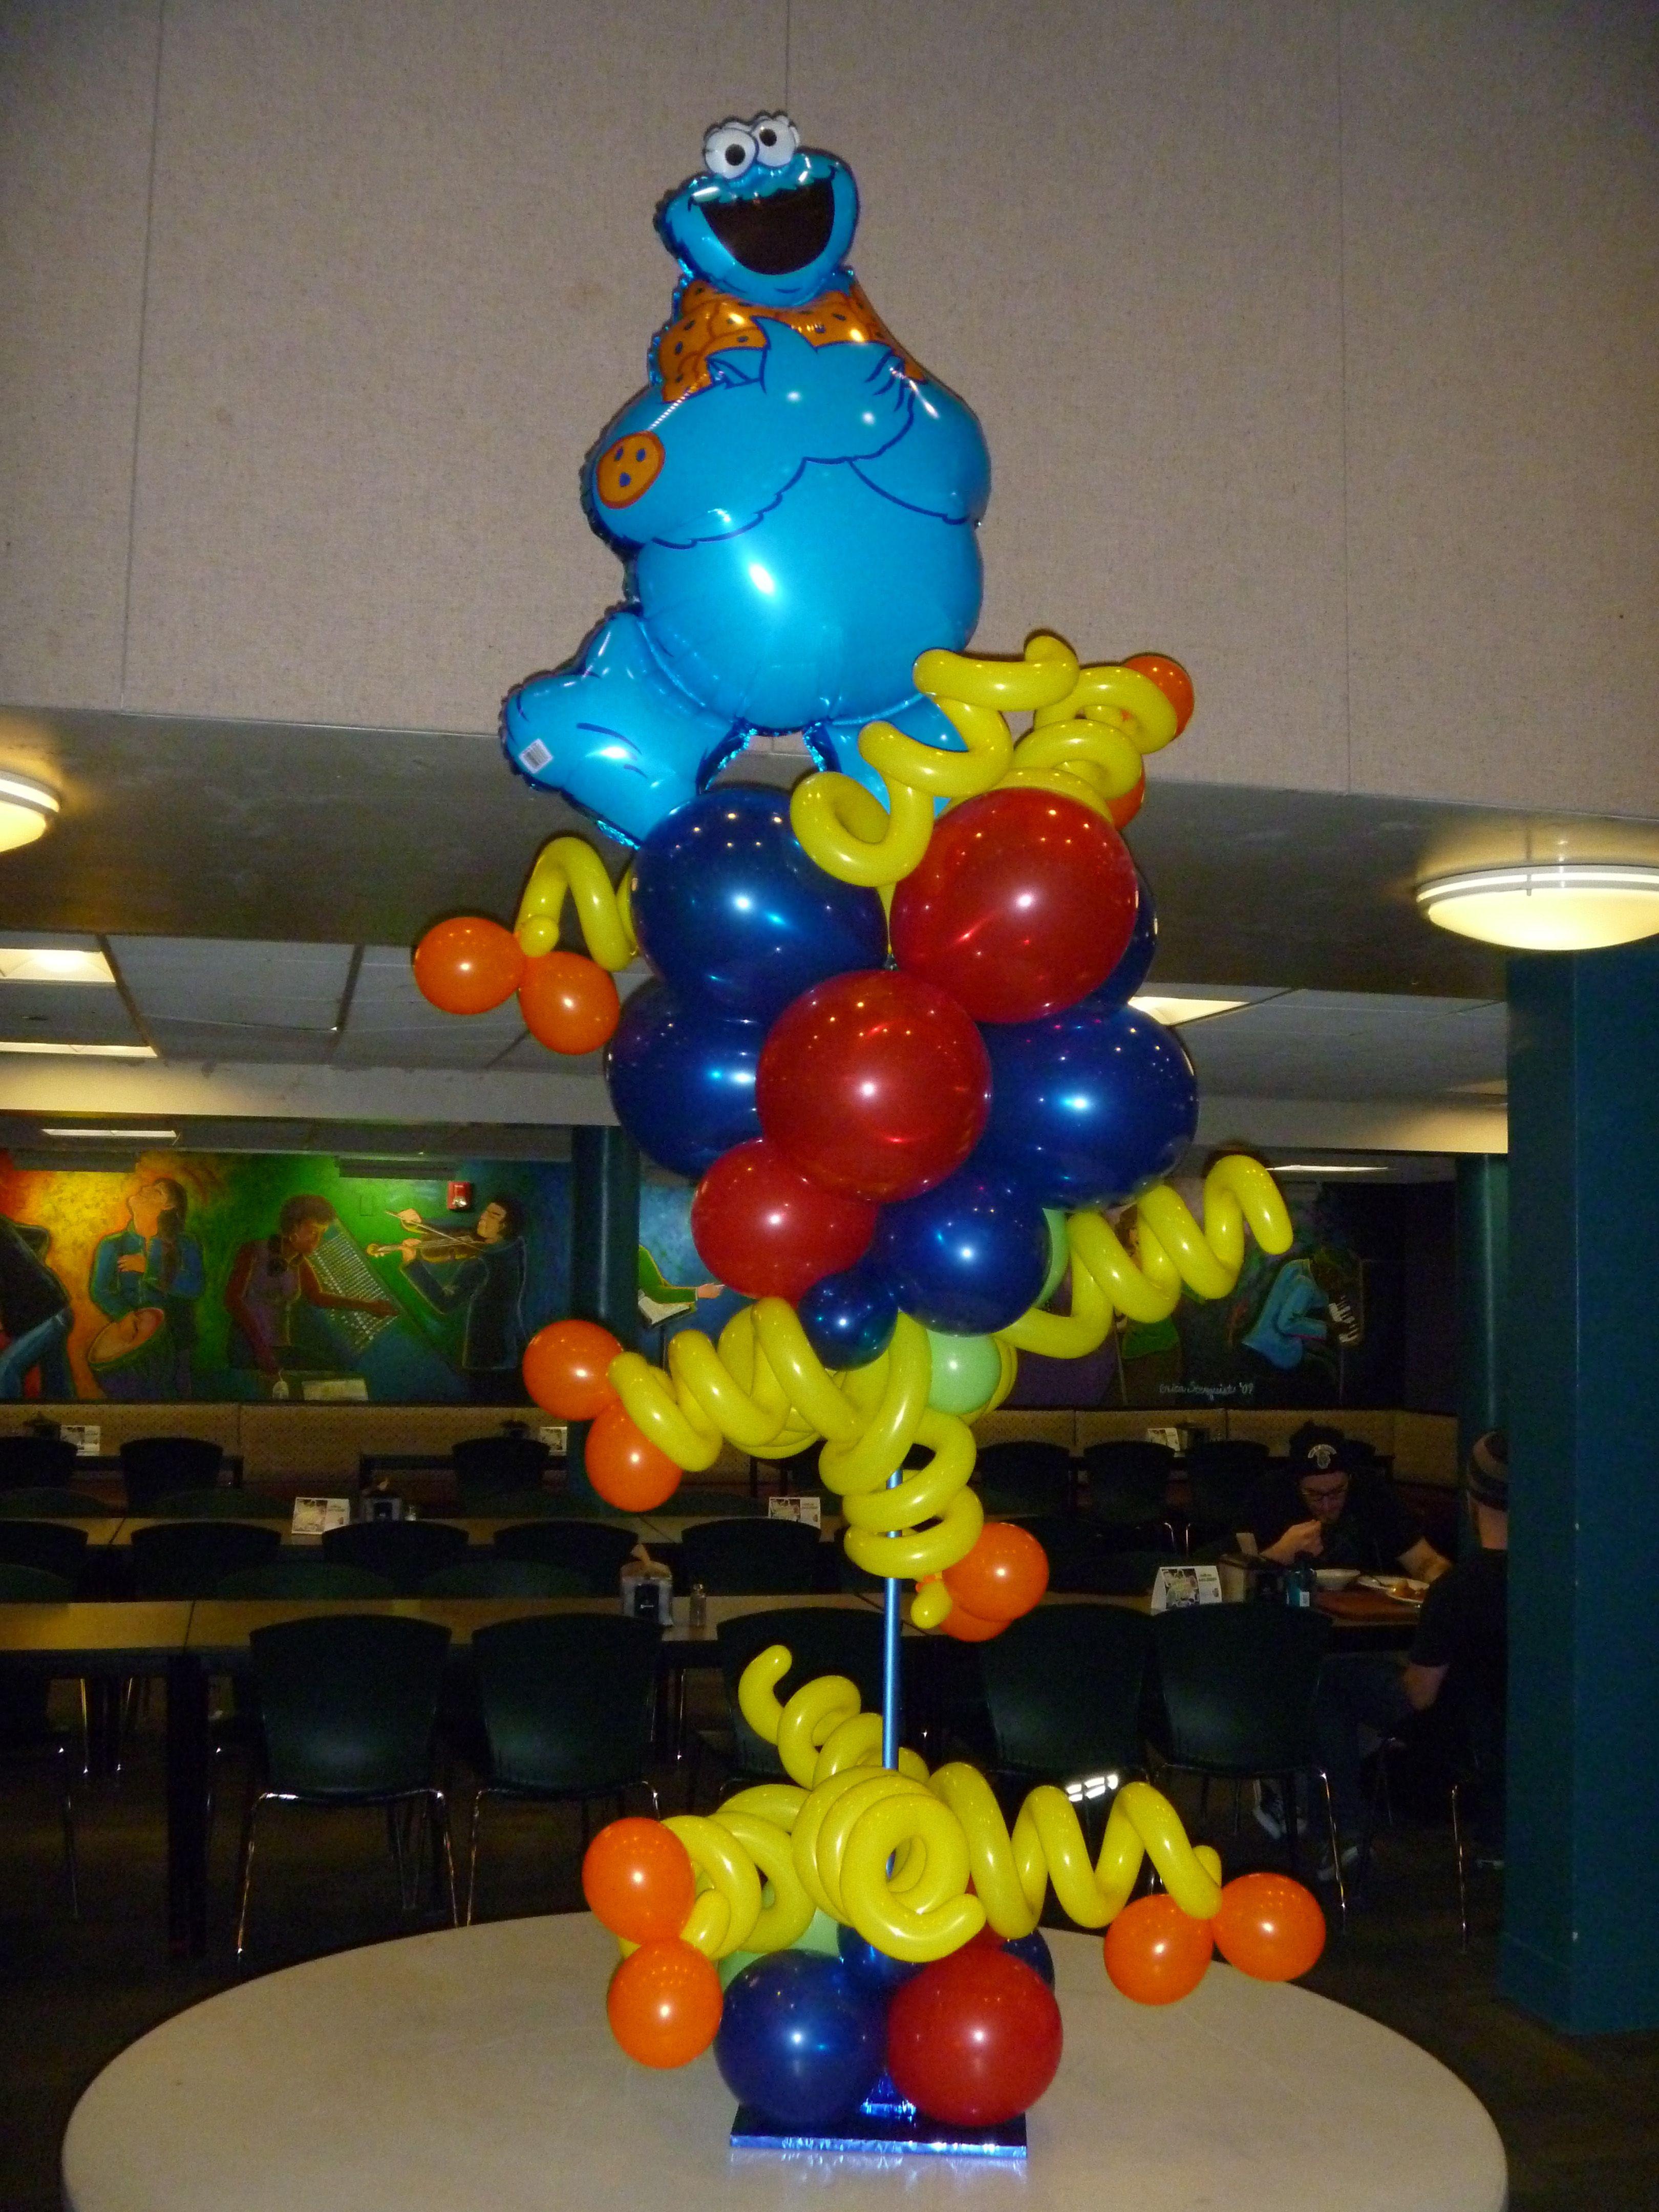 Cookie monster balloon topiary centerpiece balloon centerpieces cookie monster balloon topiary centerpiece voltagebd Images